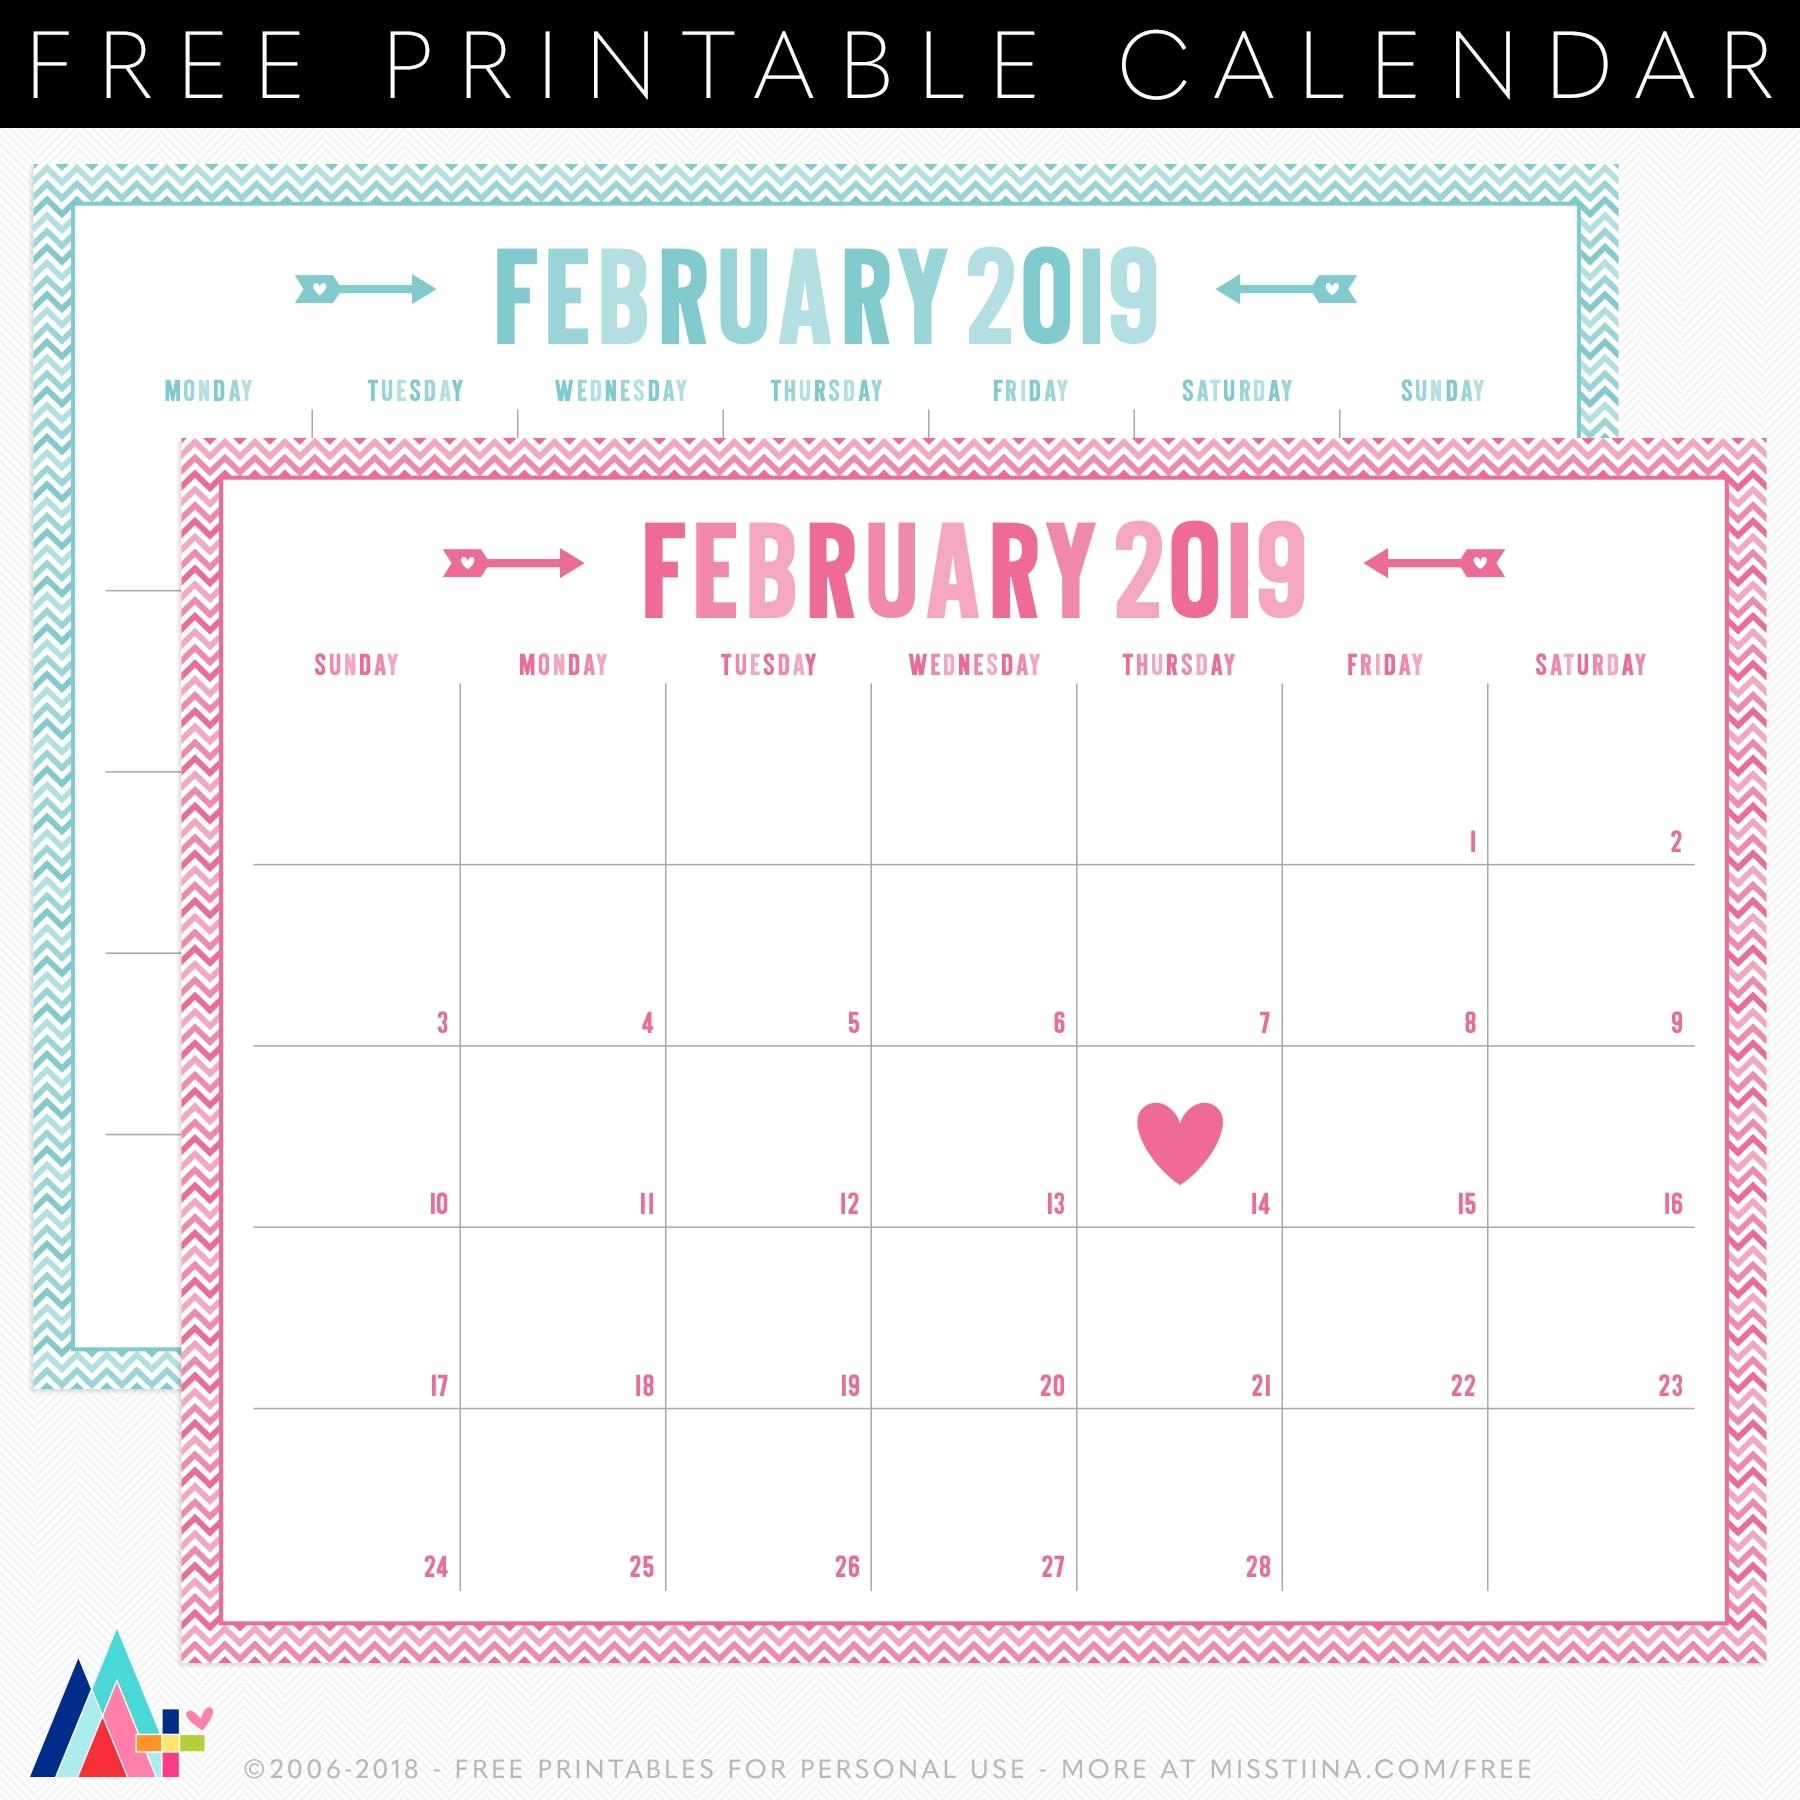 Free Printable Rainbow Calendar | Month Calendar Printable  Calender Monthly Print Outs